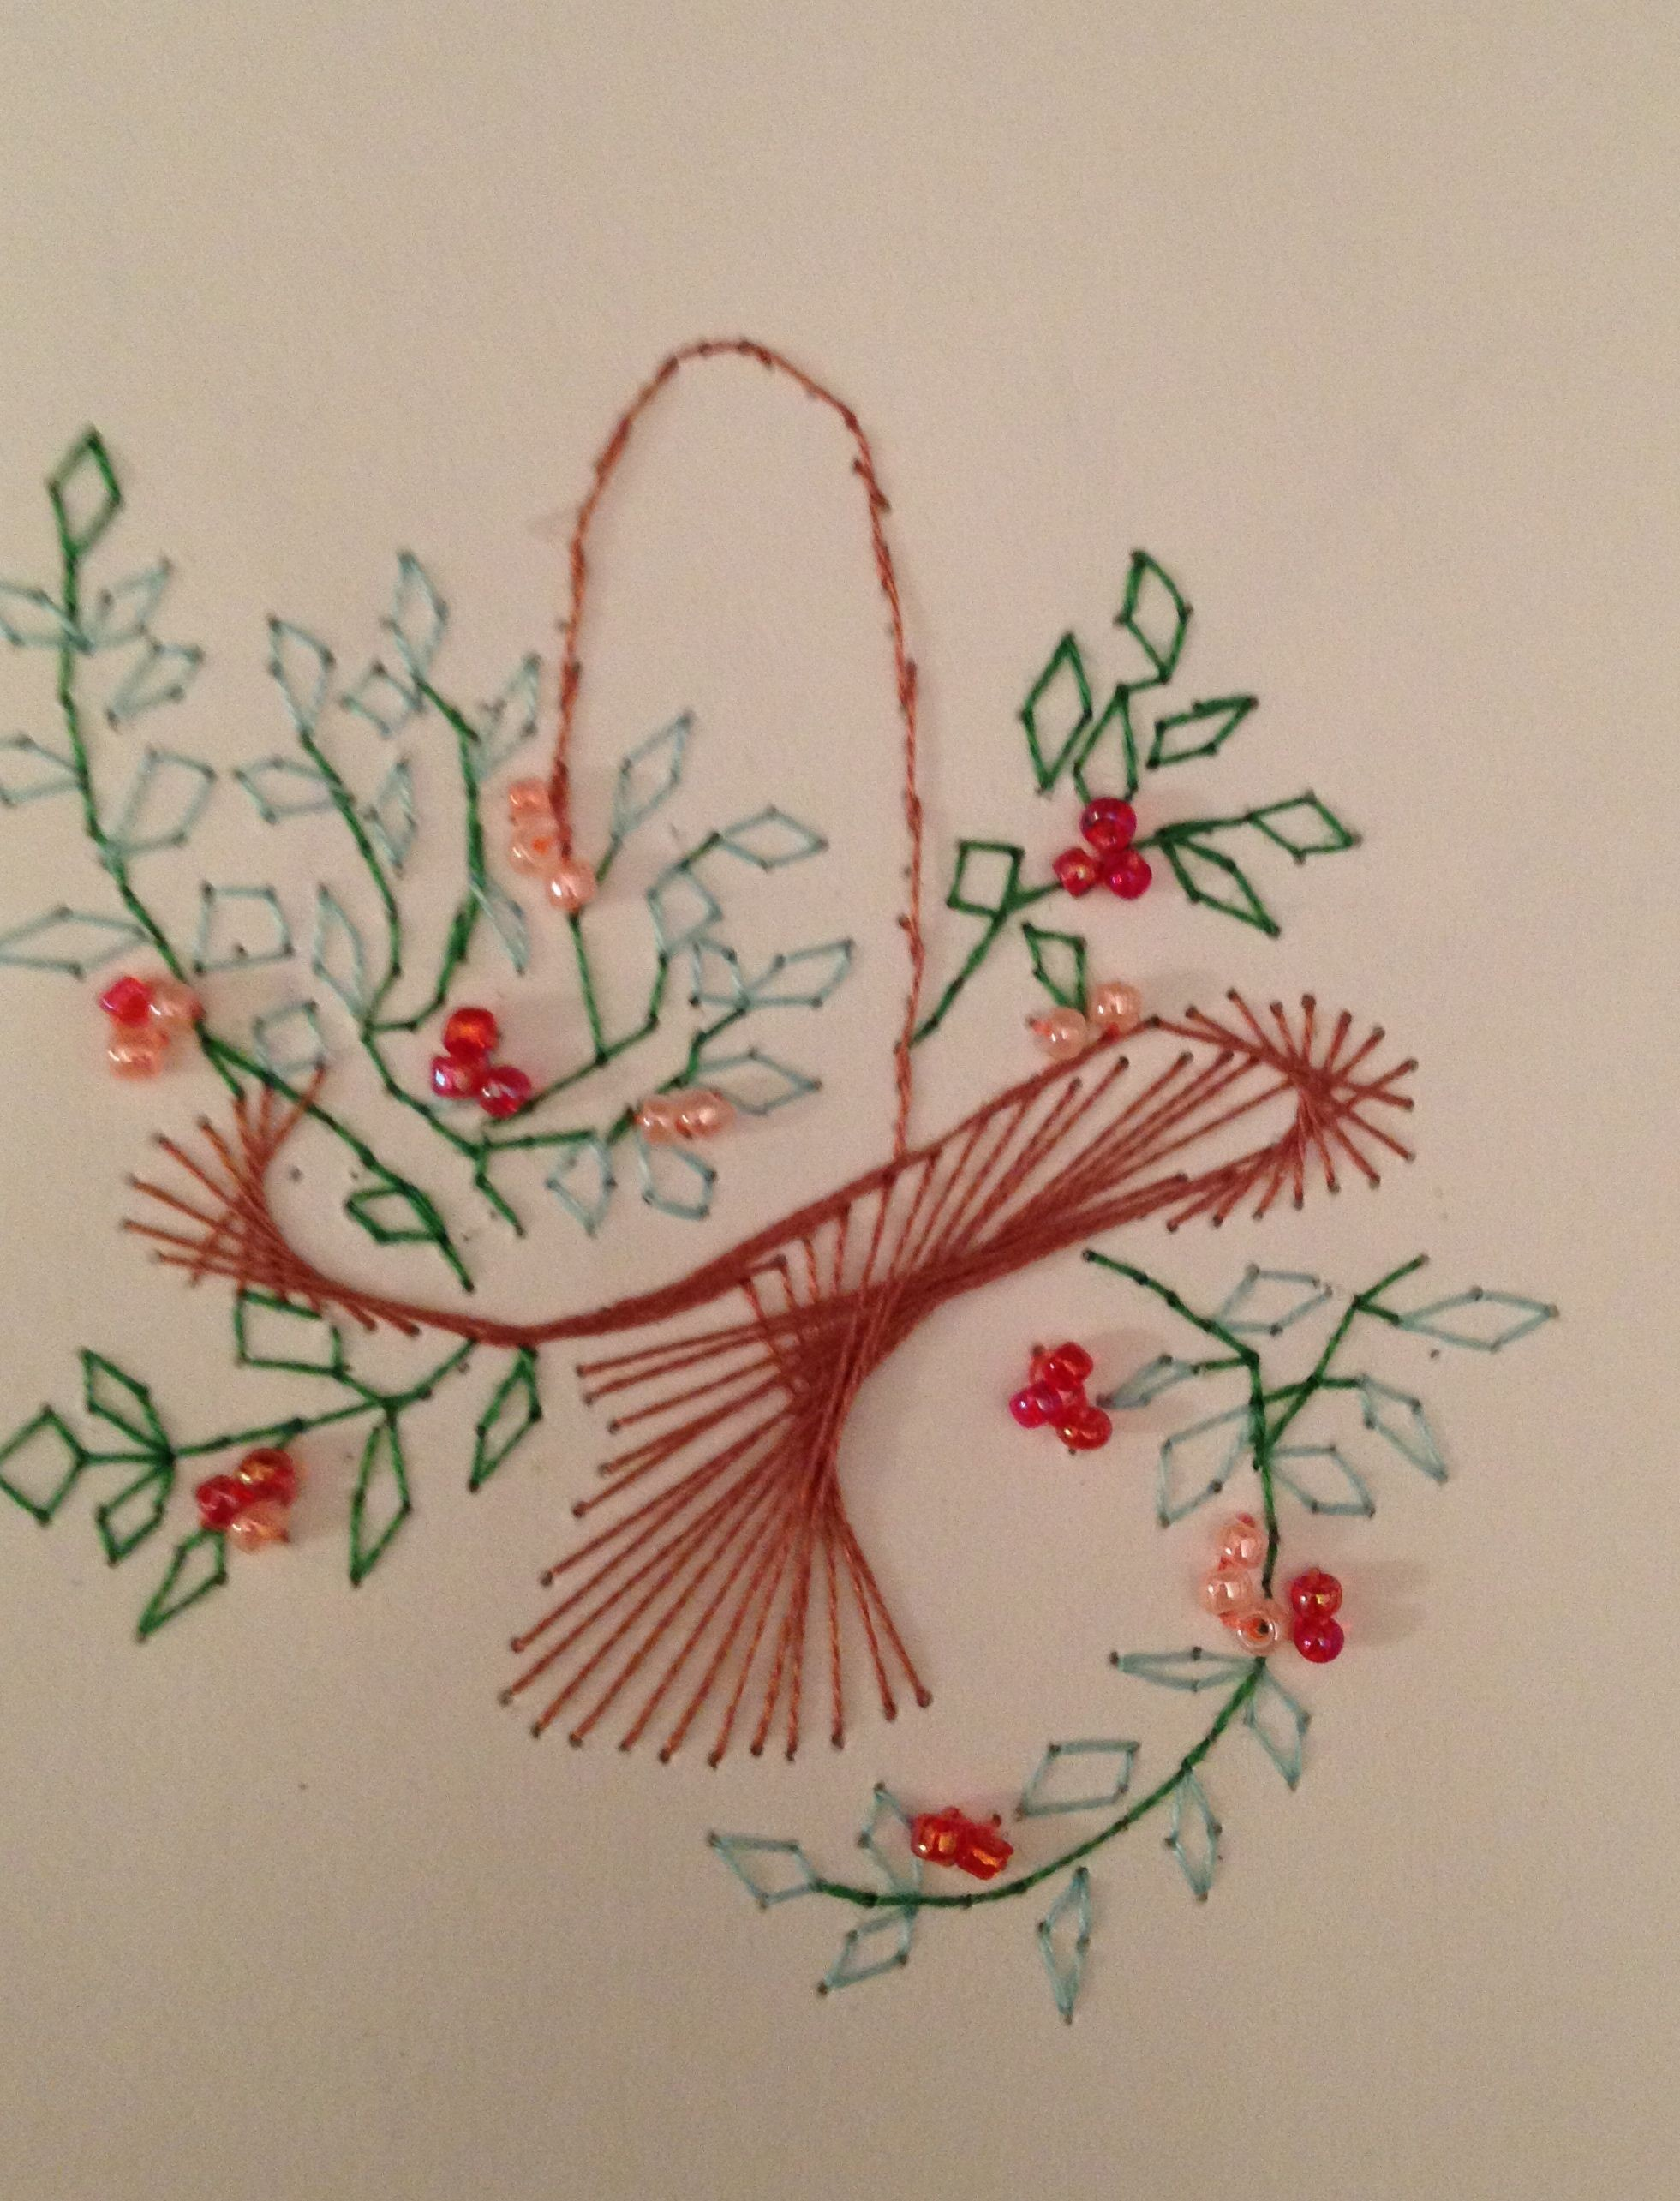 Stitch Papercraft Flower Basket Stitching Card by Pamela Turner